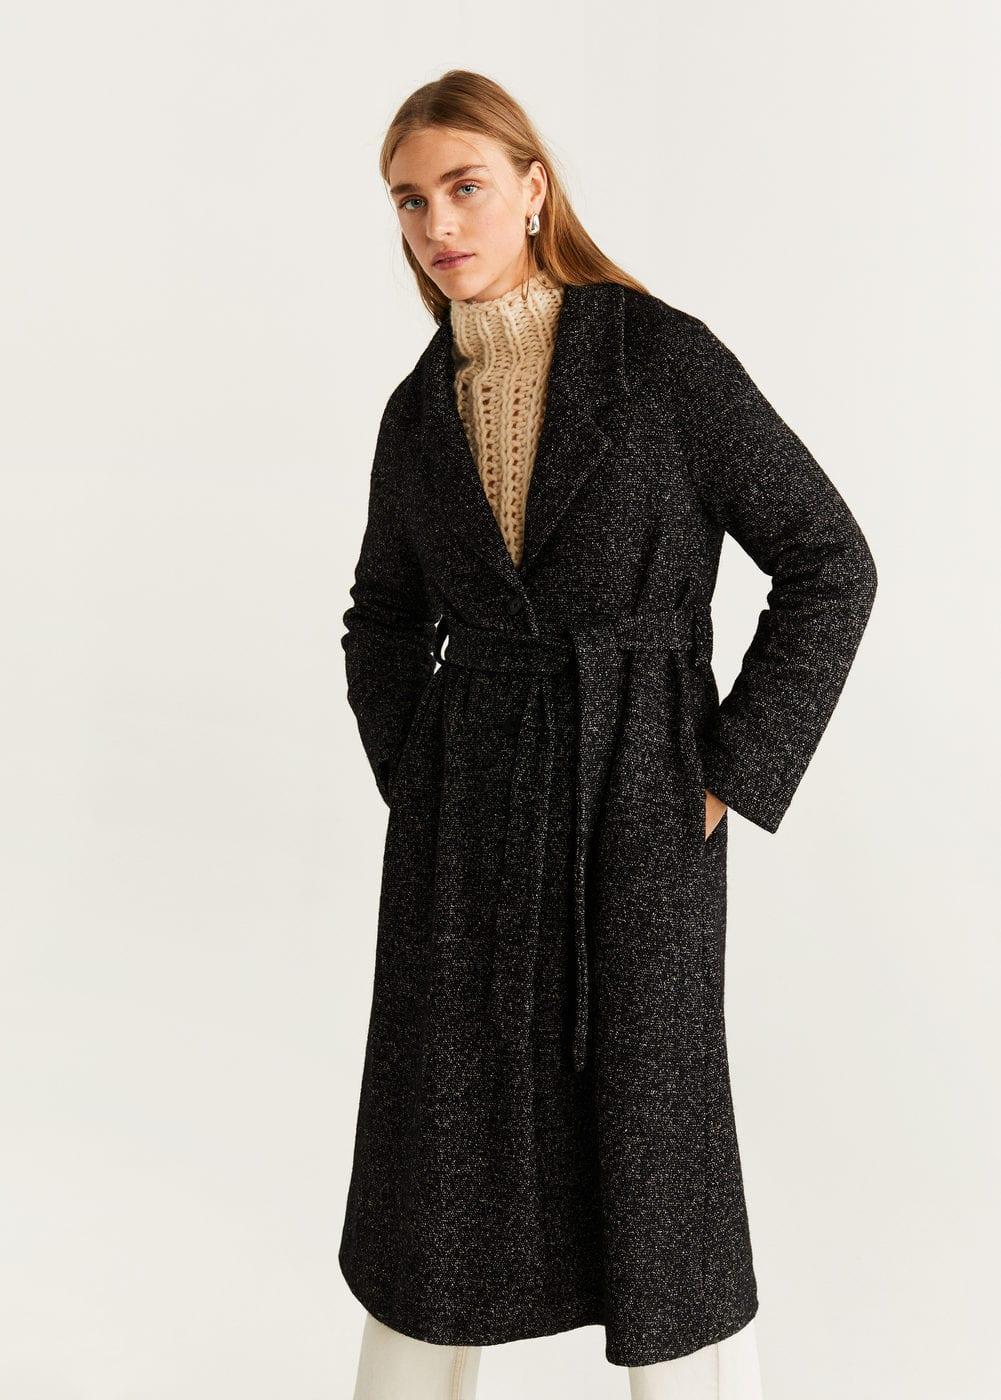 Belted Wool Coat by Mango